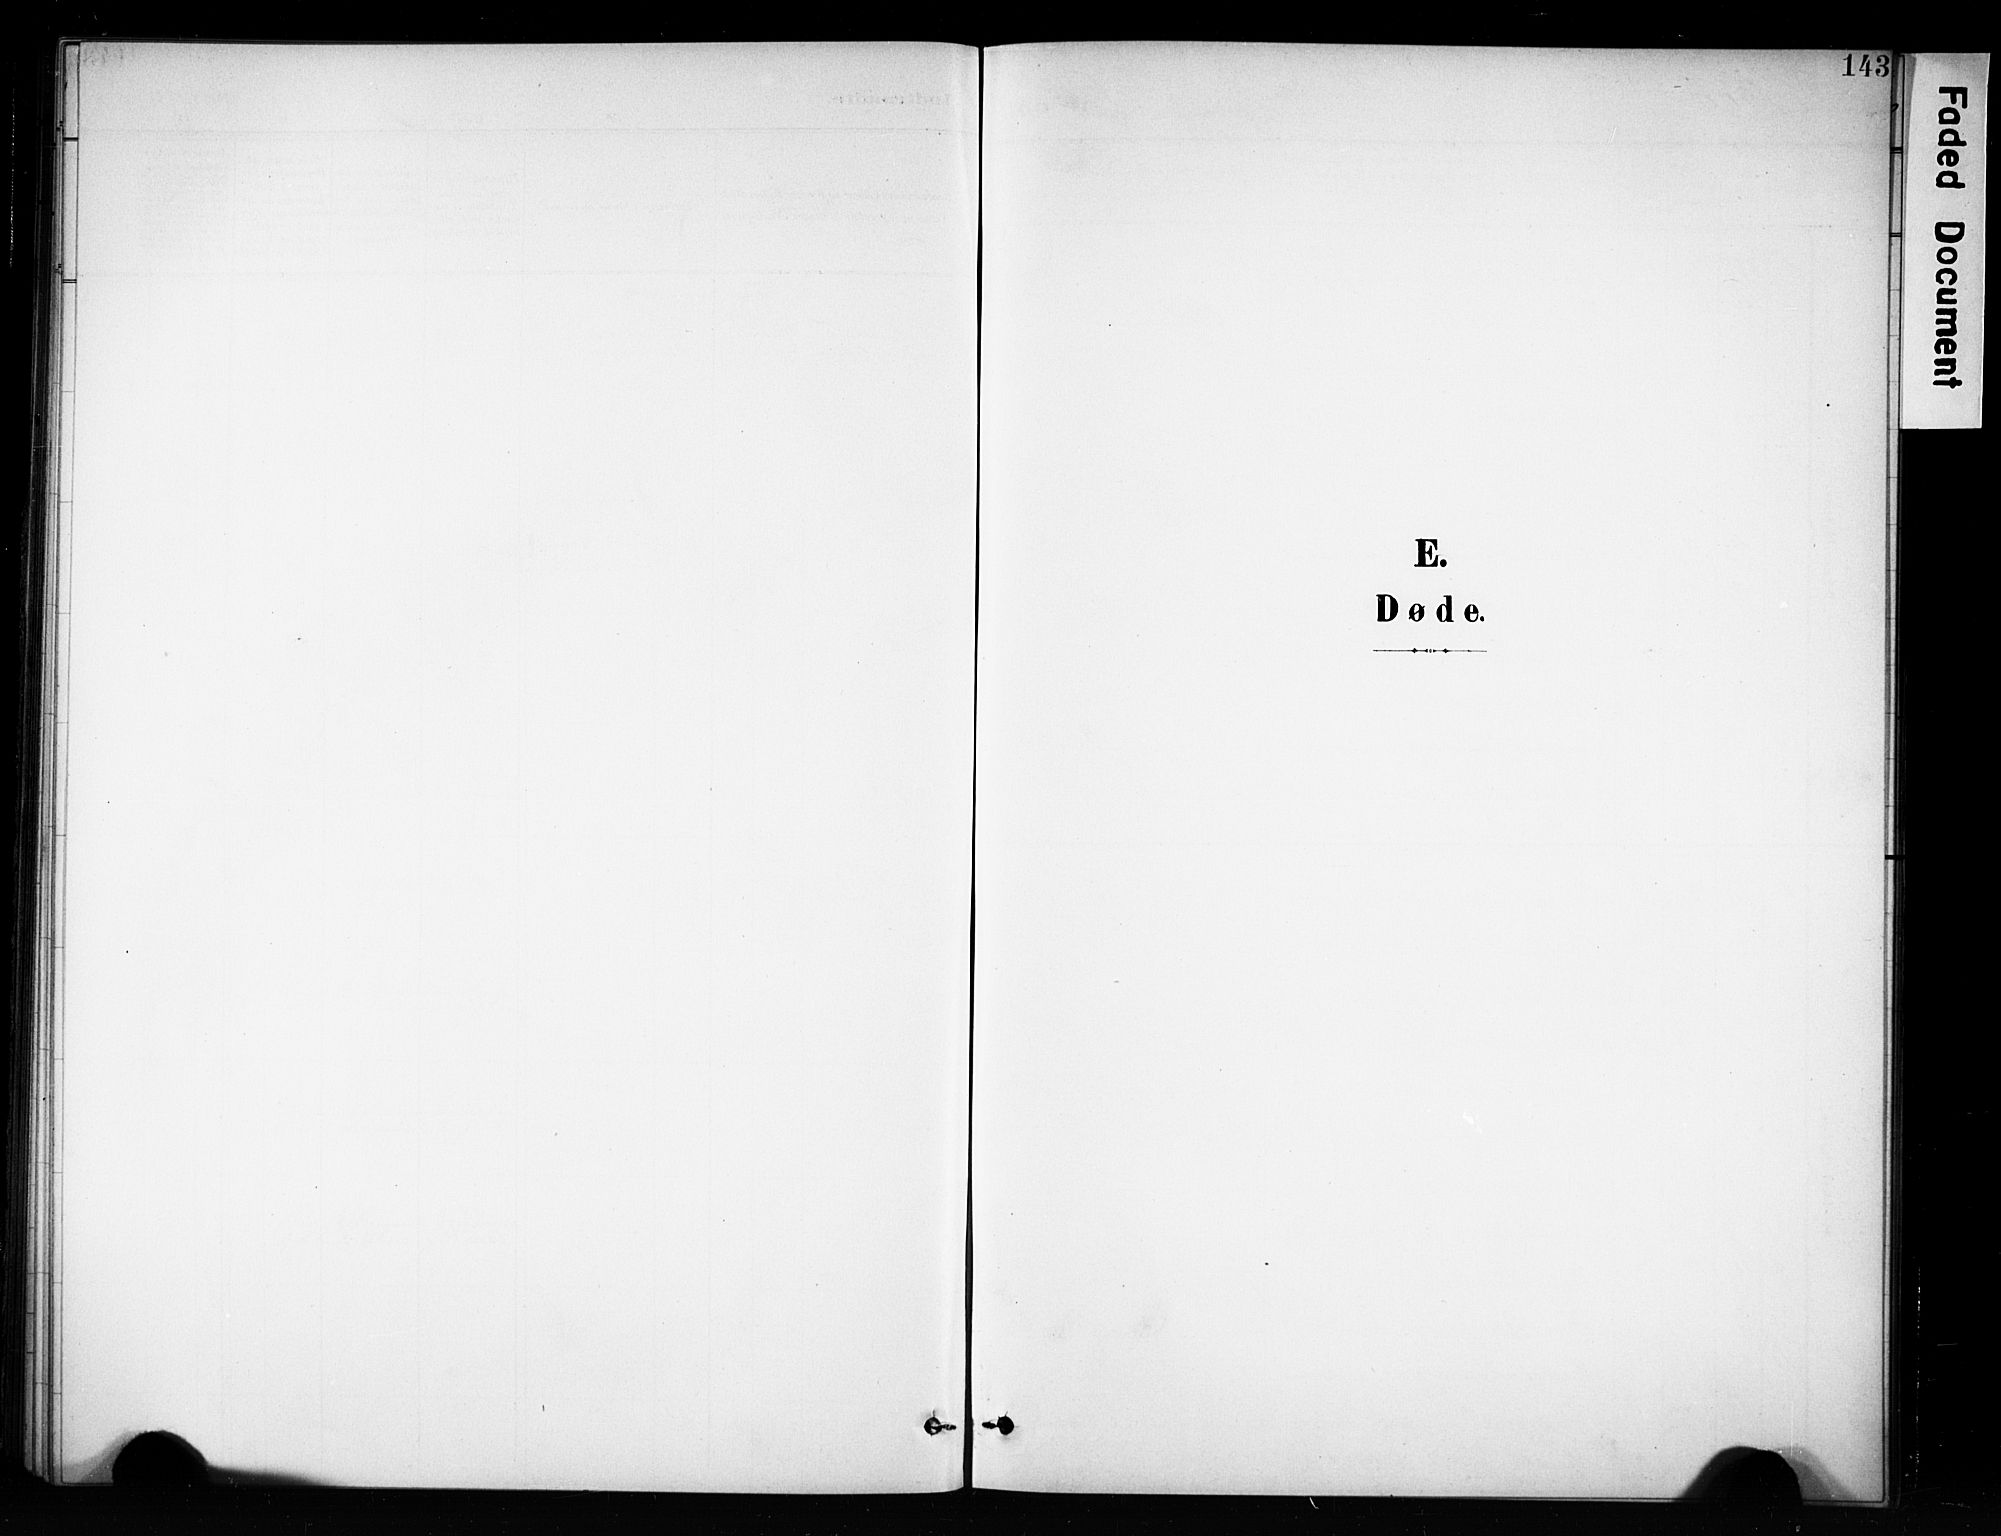 SAH, Brandbu prestekontor, Klokkerbok nr. 5, 1900-1913, s. 143